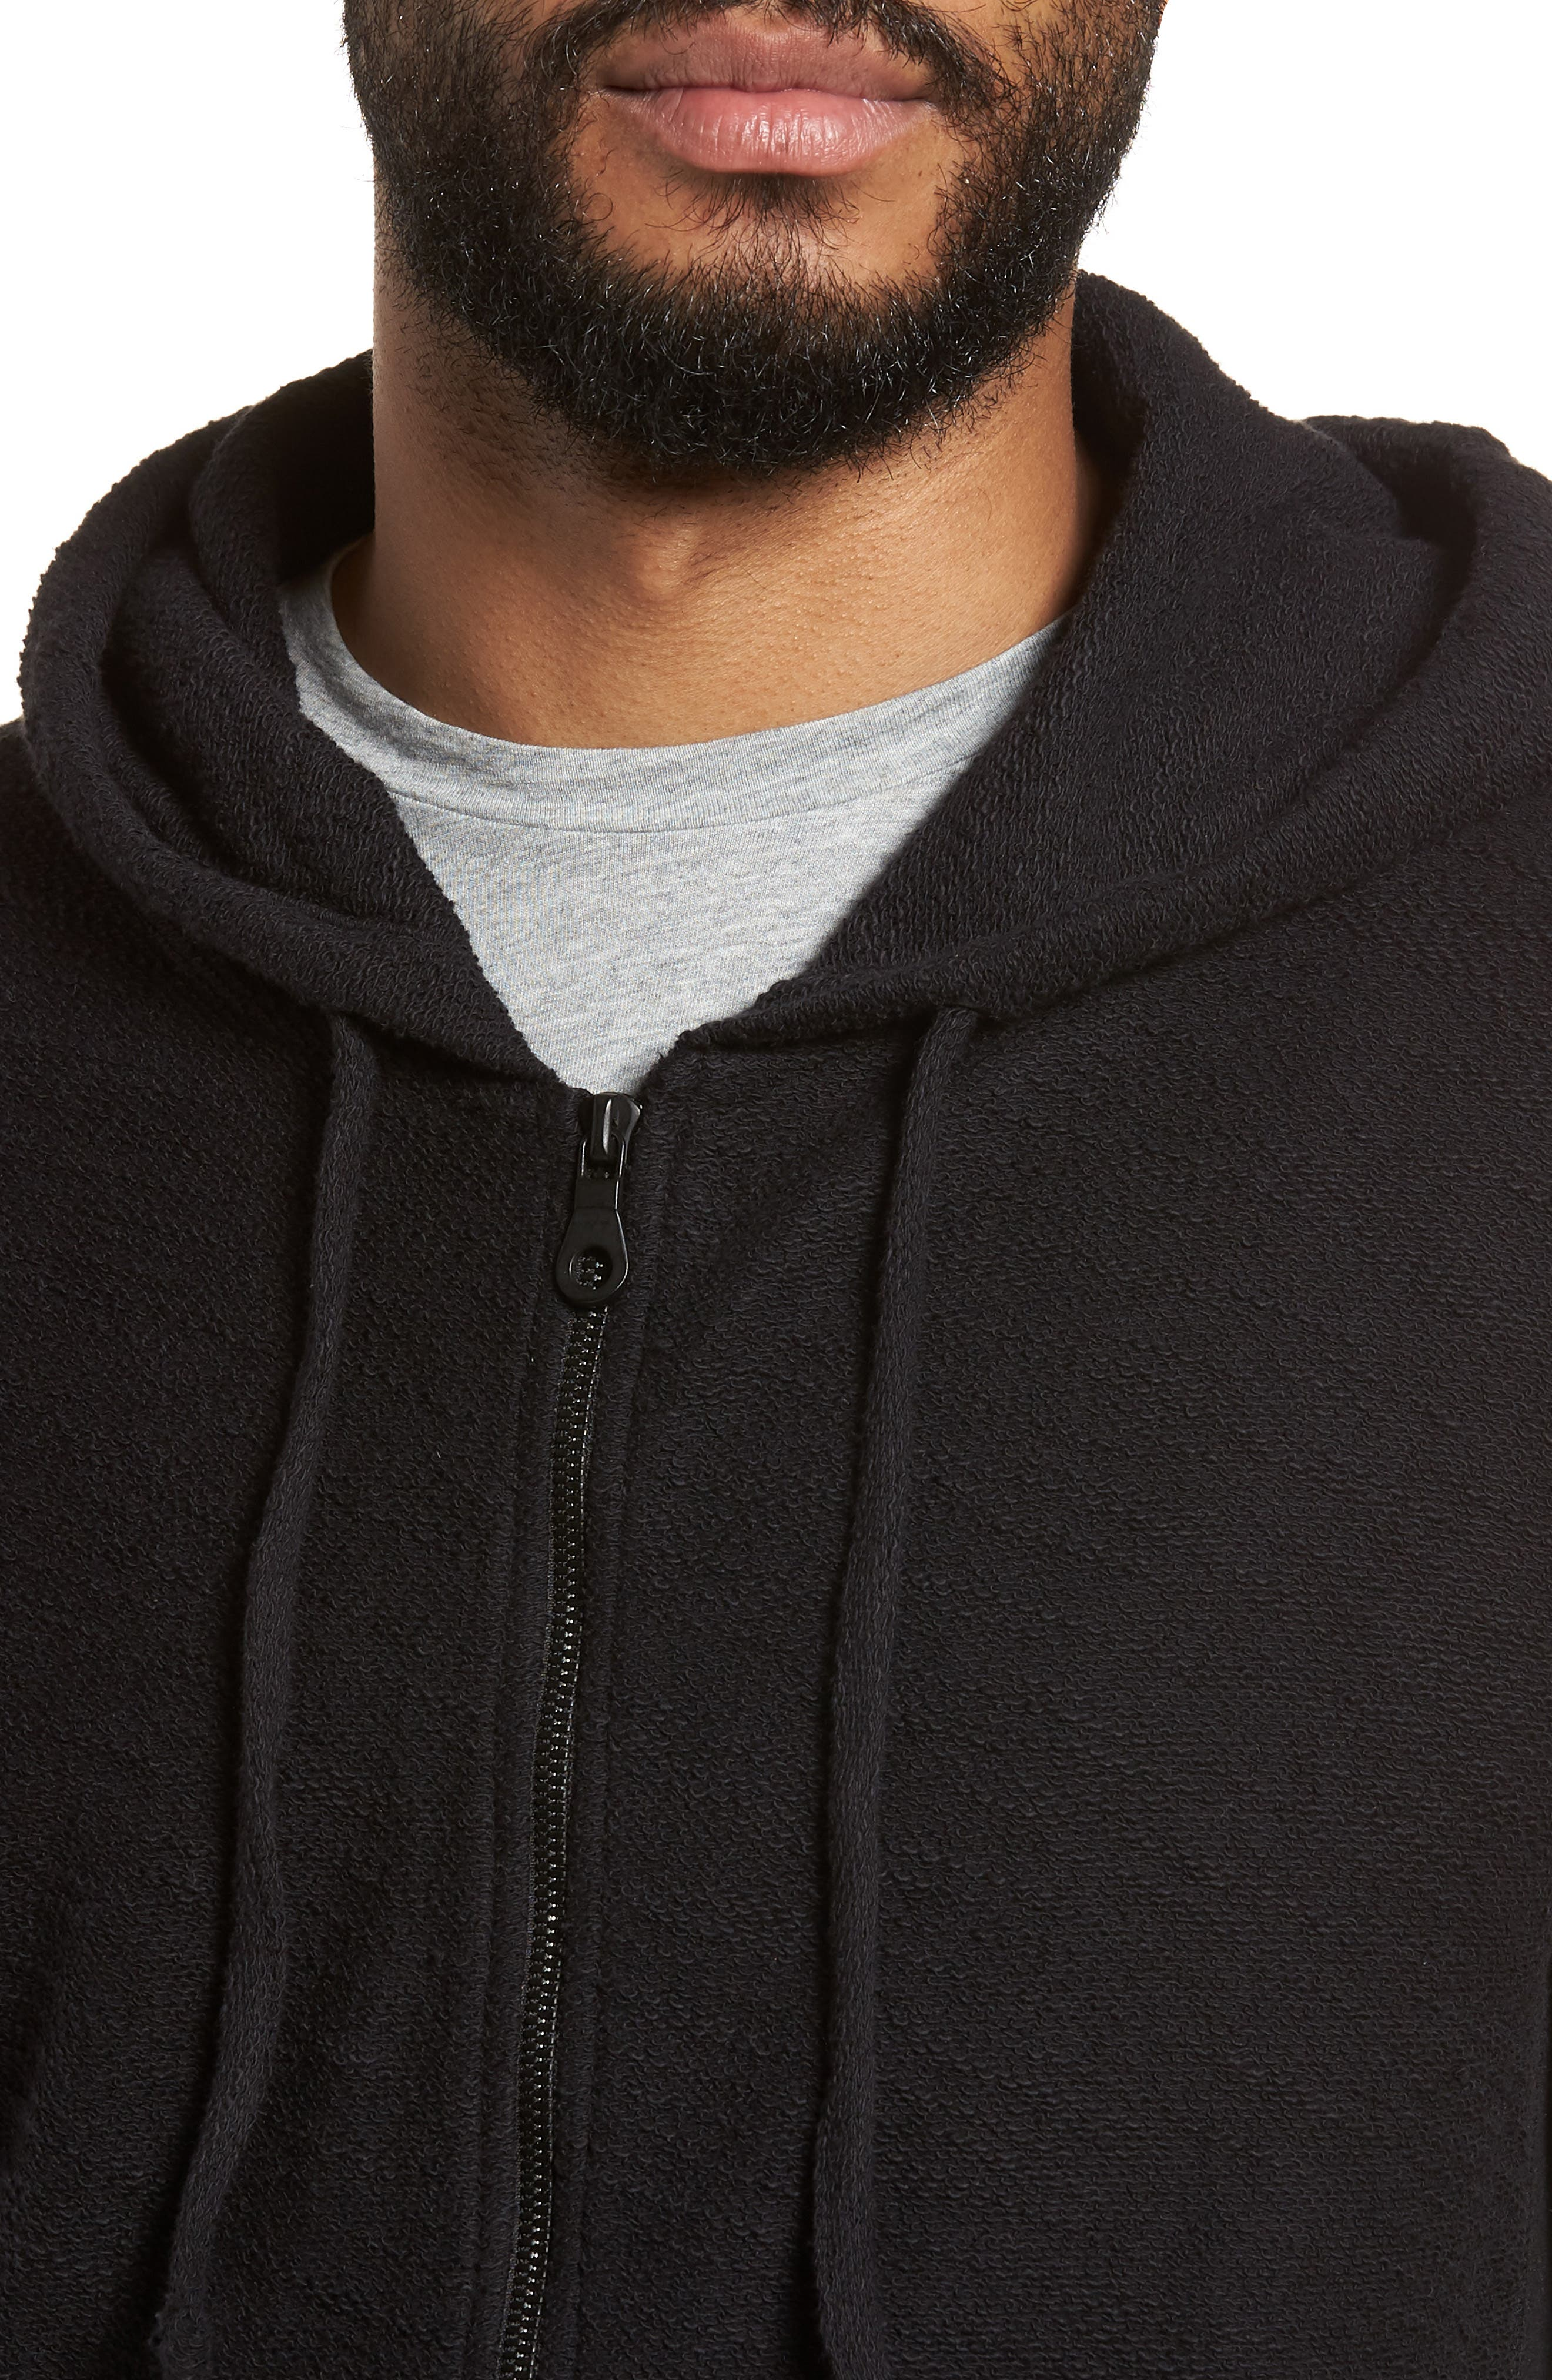 Terrycloth Cotton Blend Zip Hoodie,                             Alternate thumbnail 4, color,                             Black